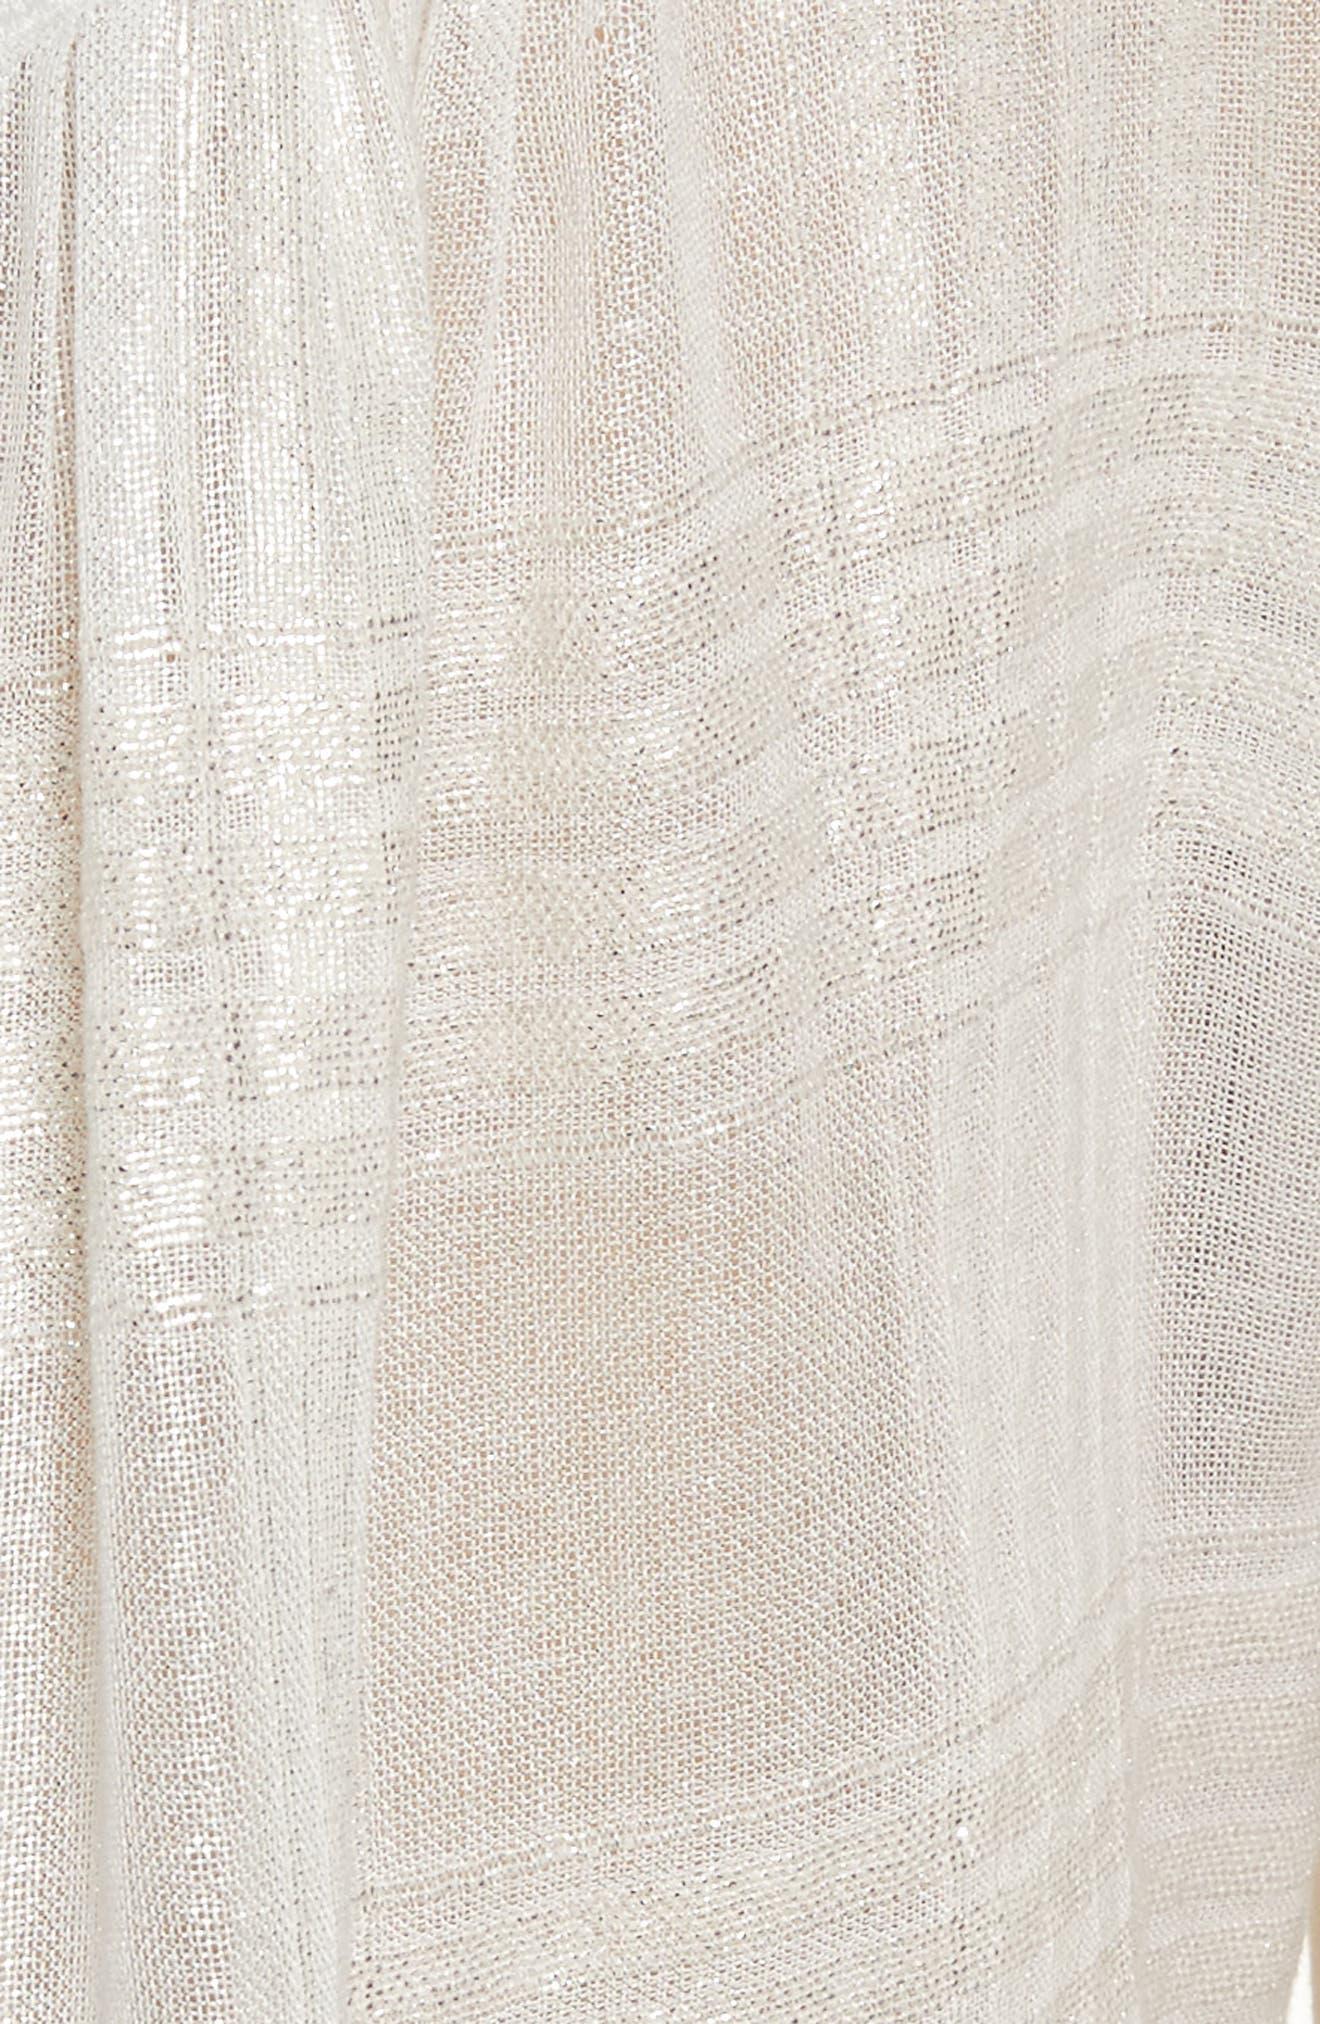 Ginesa Lace Yoke Metallic Blouse,                             Alternate thumbnail 5, color,                             Off White